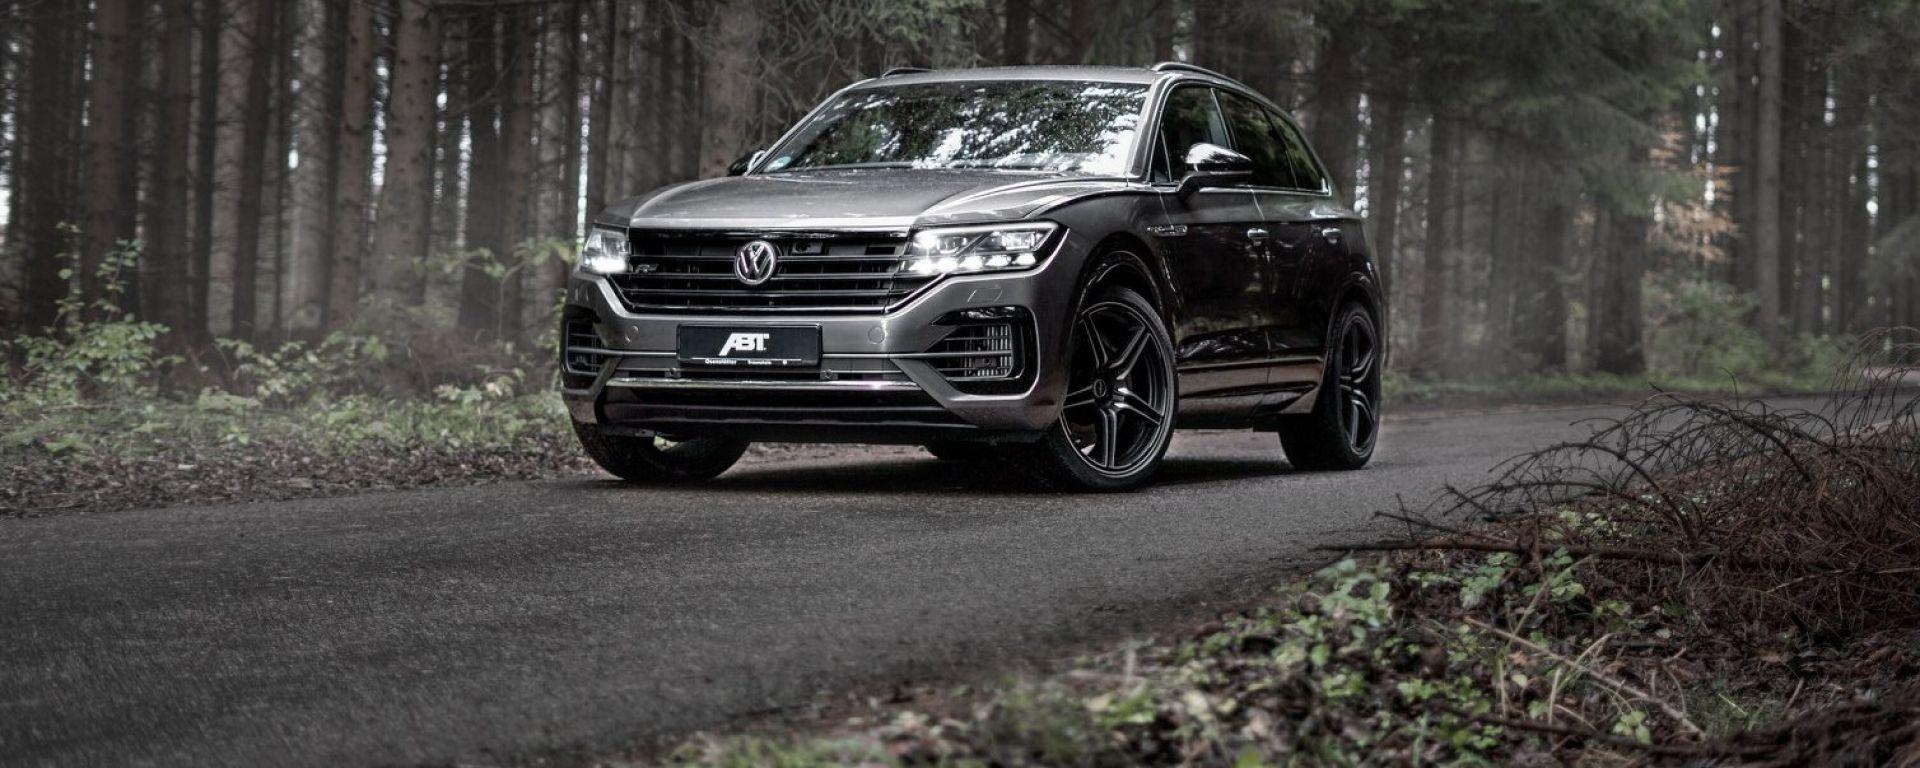 Volkswagen Touareg rivisitato da ABT: 500 CV per gradire